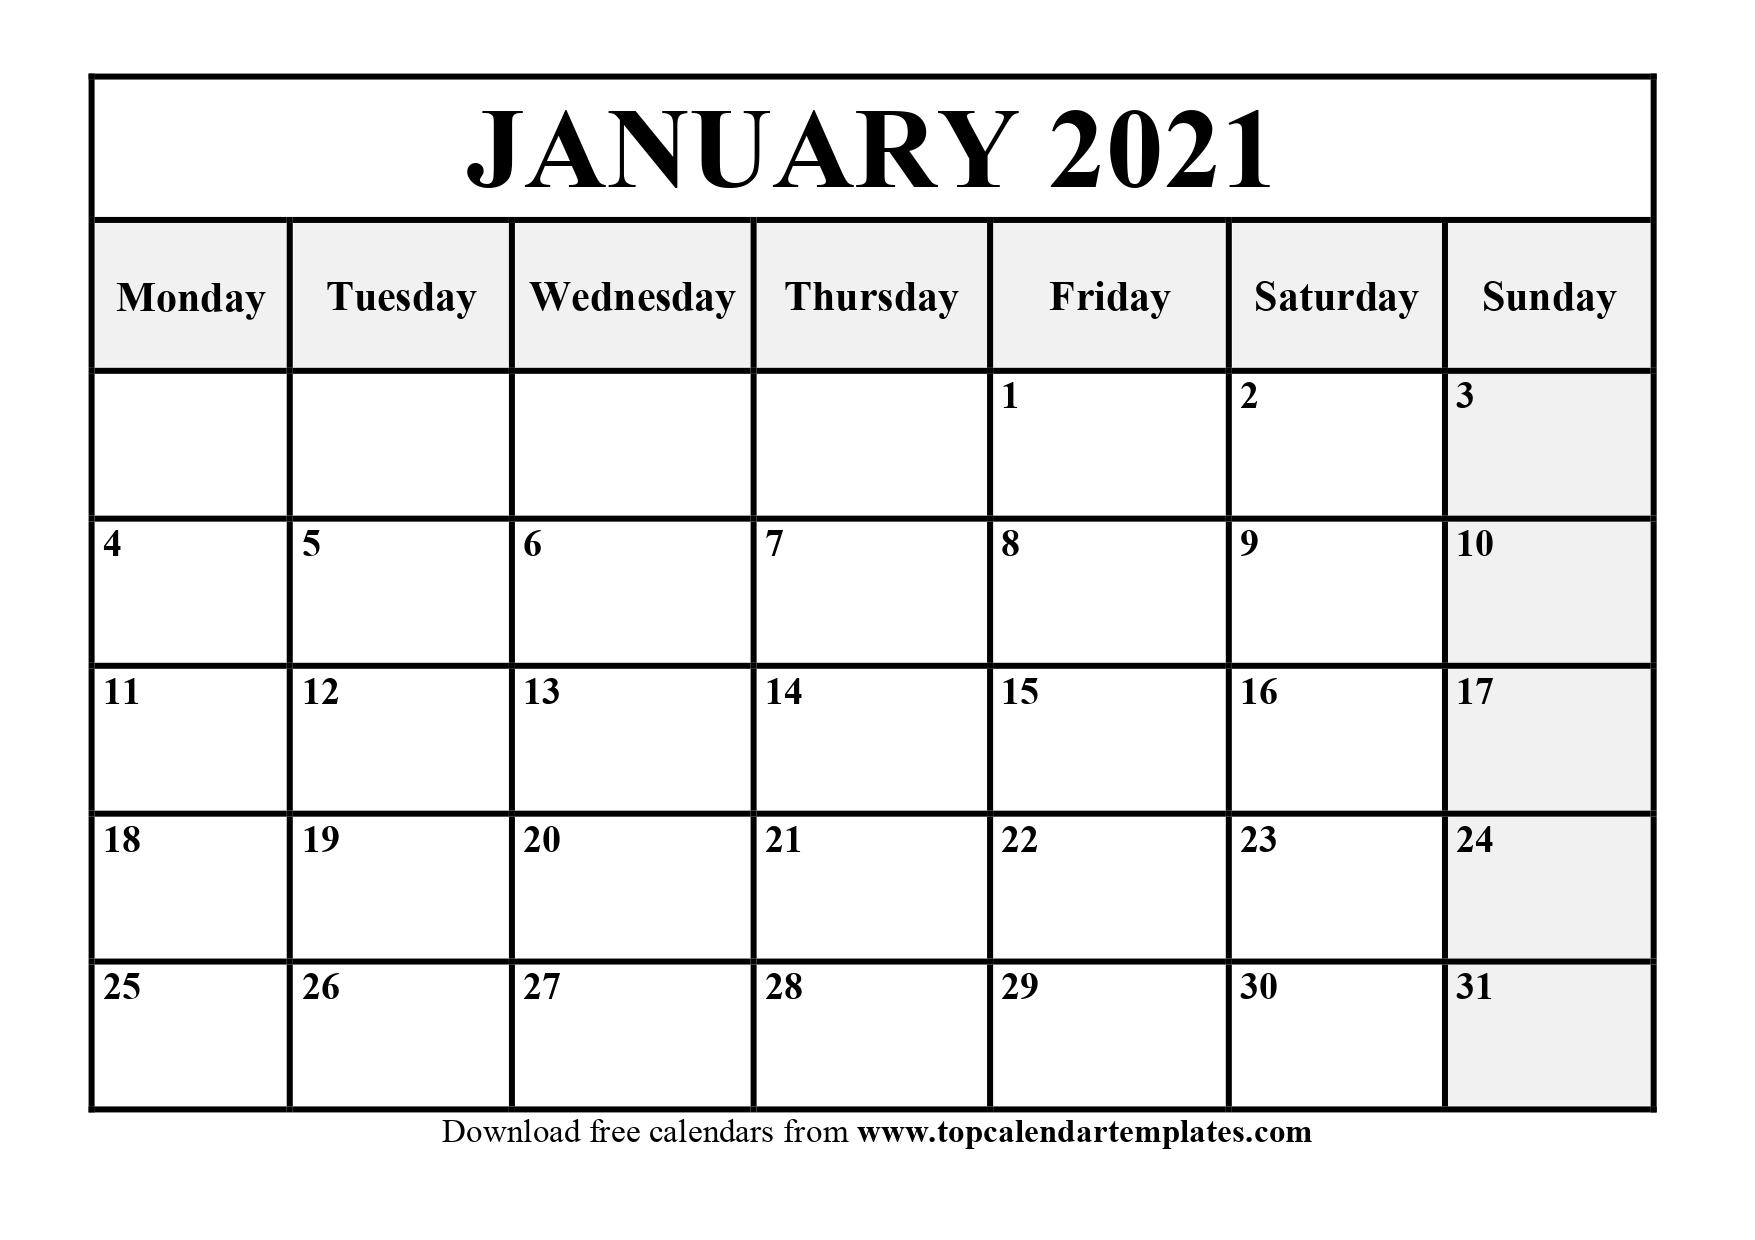 Free January 2021 Calendar Printable Pdf Word 6